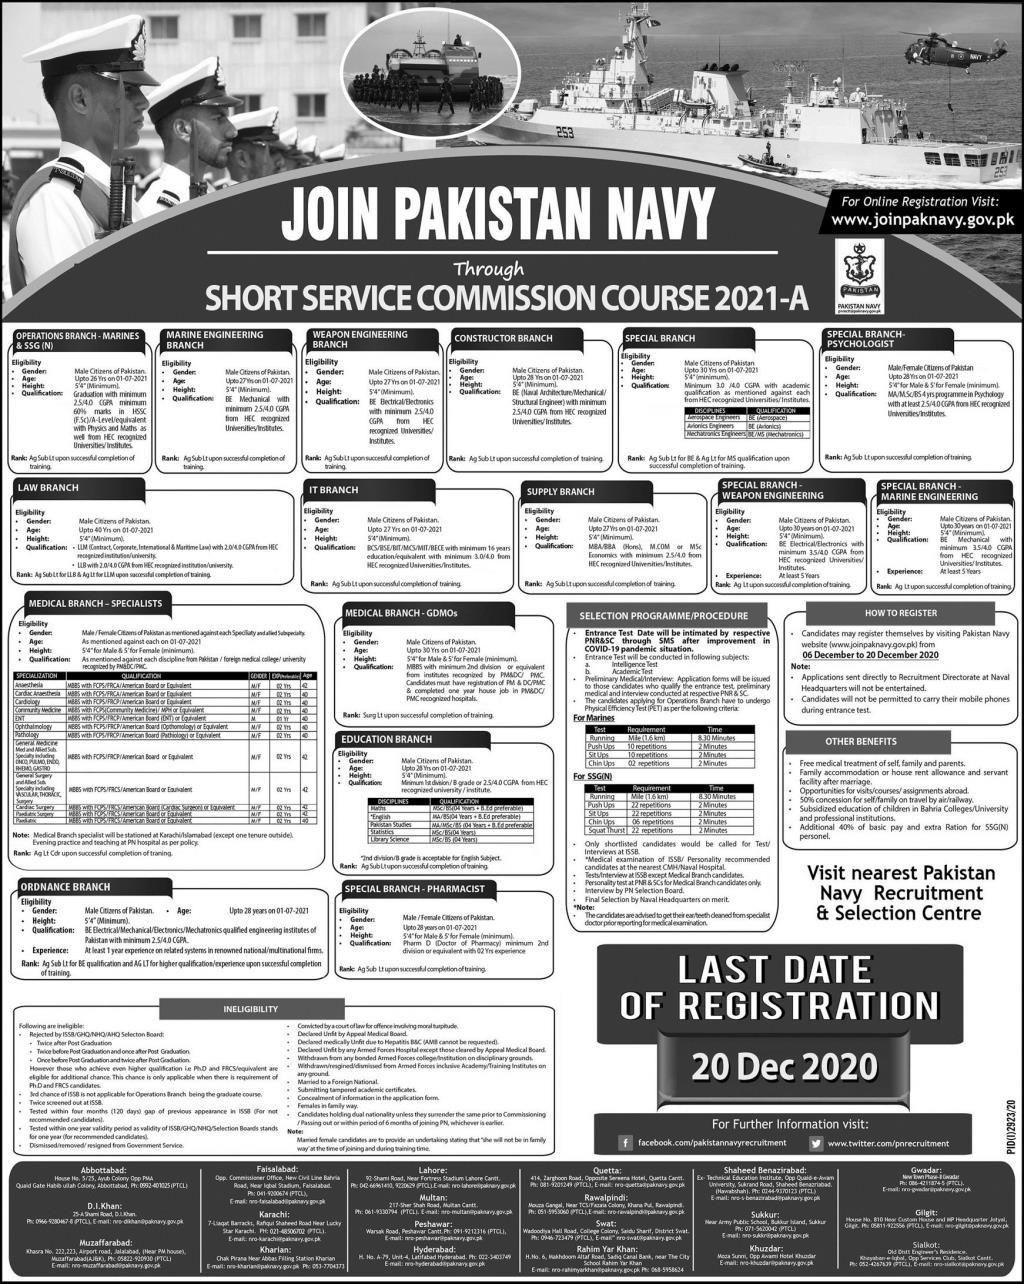 Join Pak Navy Short Service Commission 2021 A